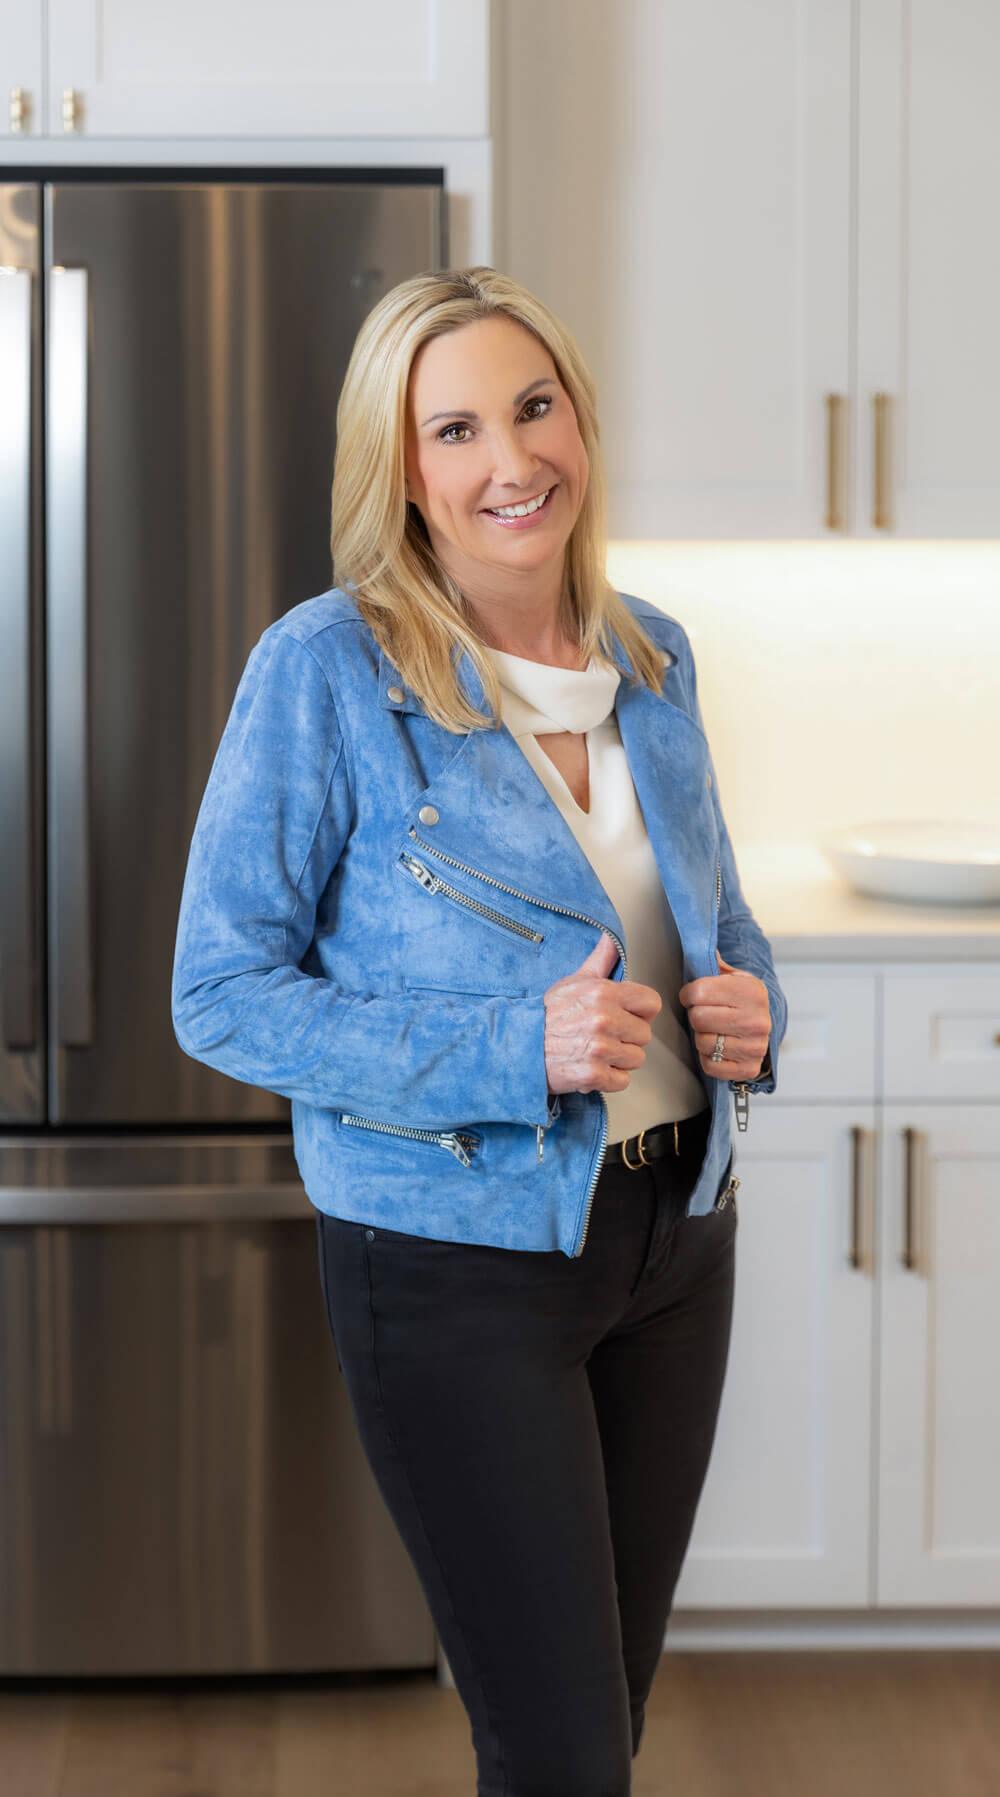 Contact North Texas Interior Designer Holly Gallagher